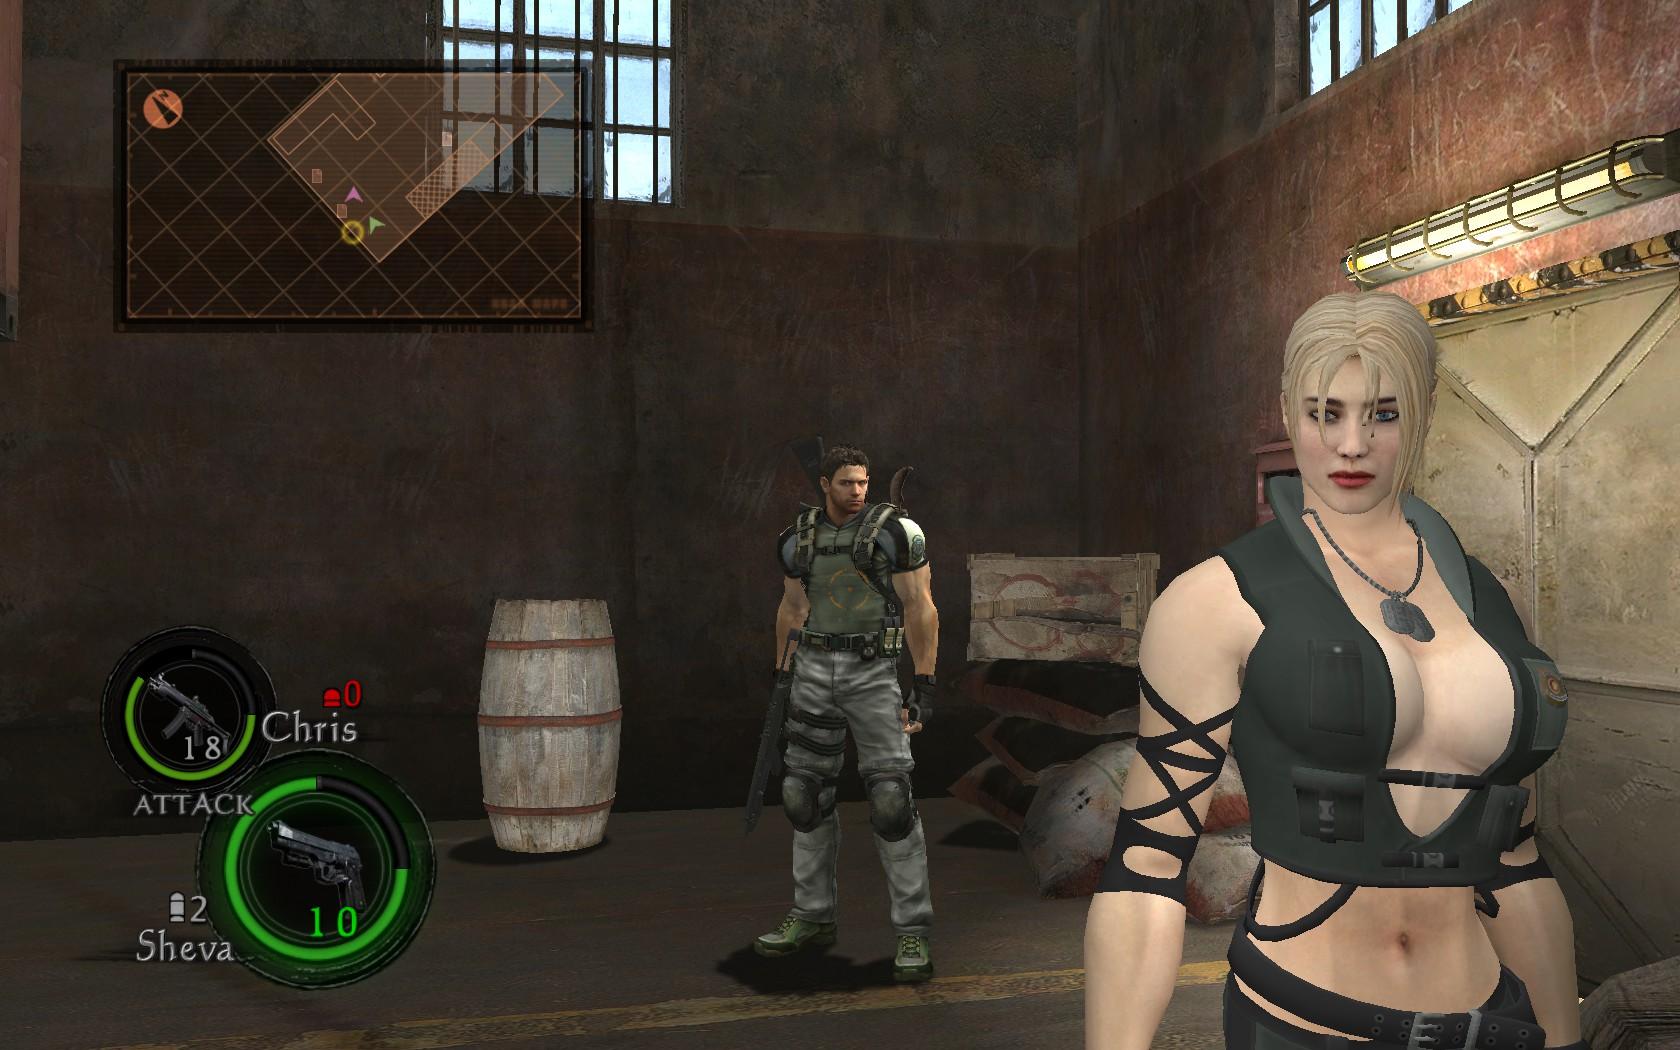 Mortal Kombat Girls 0_11f043_fb73f1e8_orig